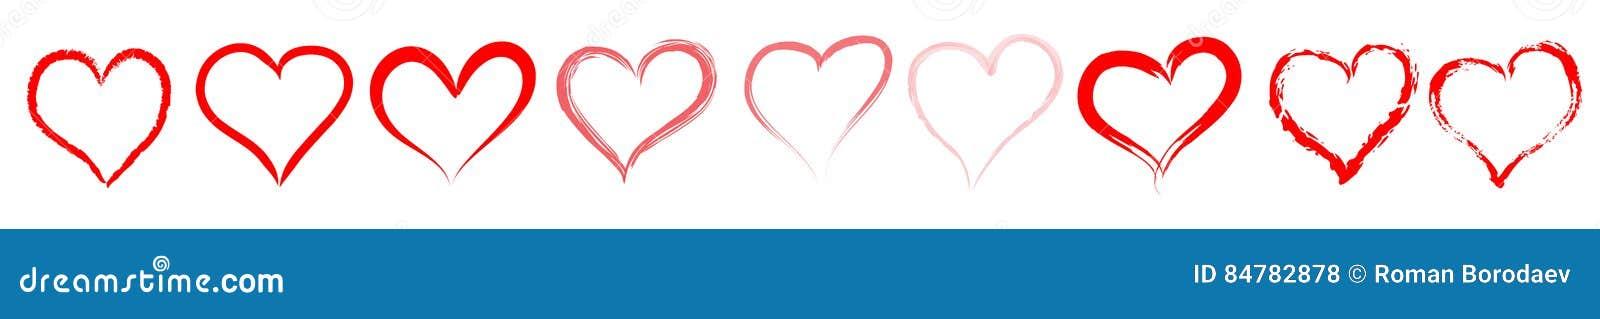 Czerwona serce linia, divider/